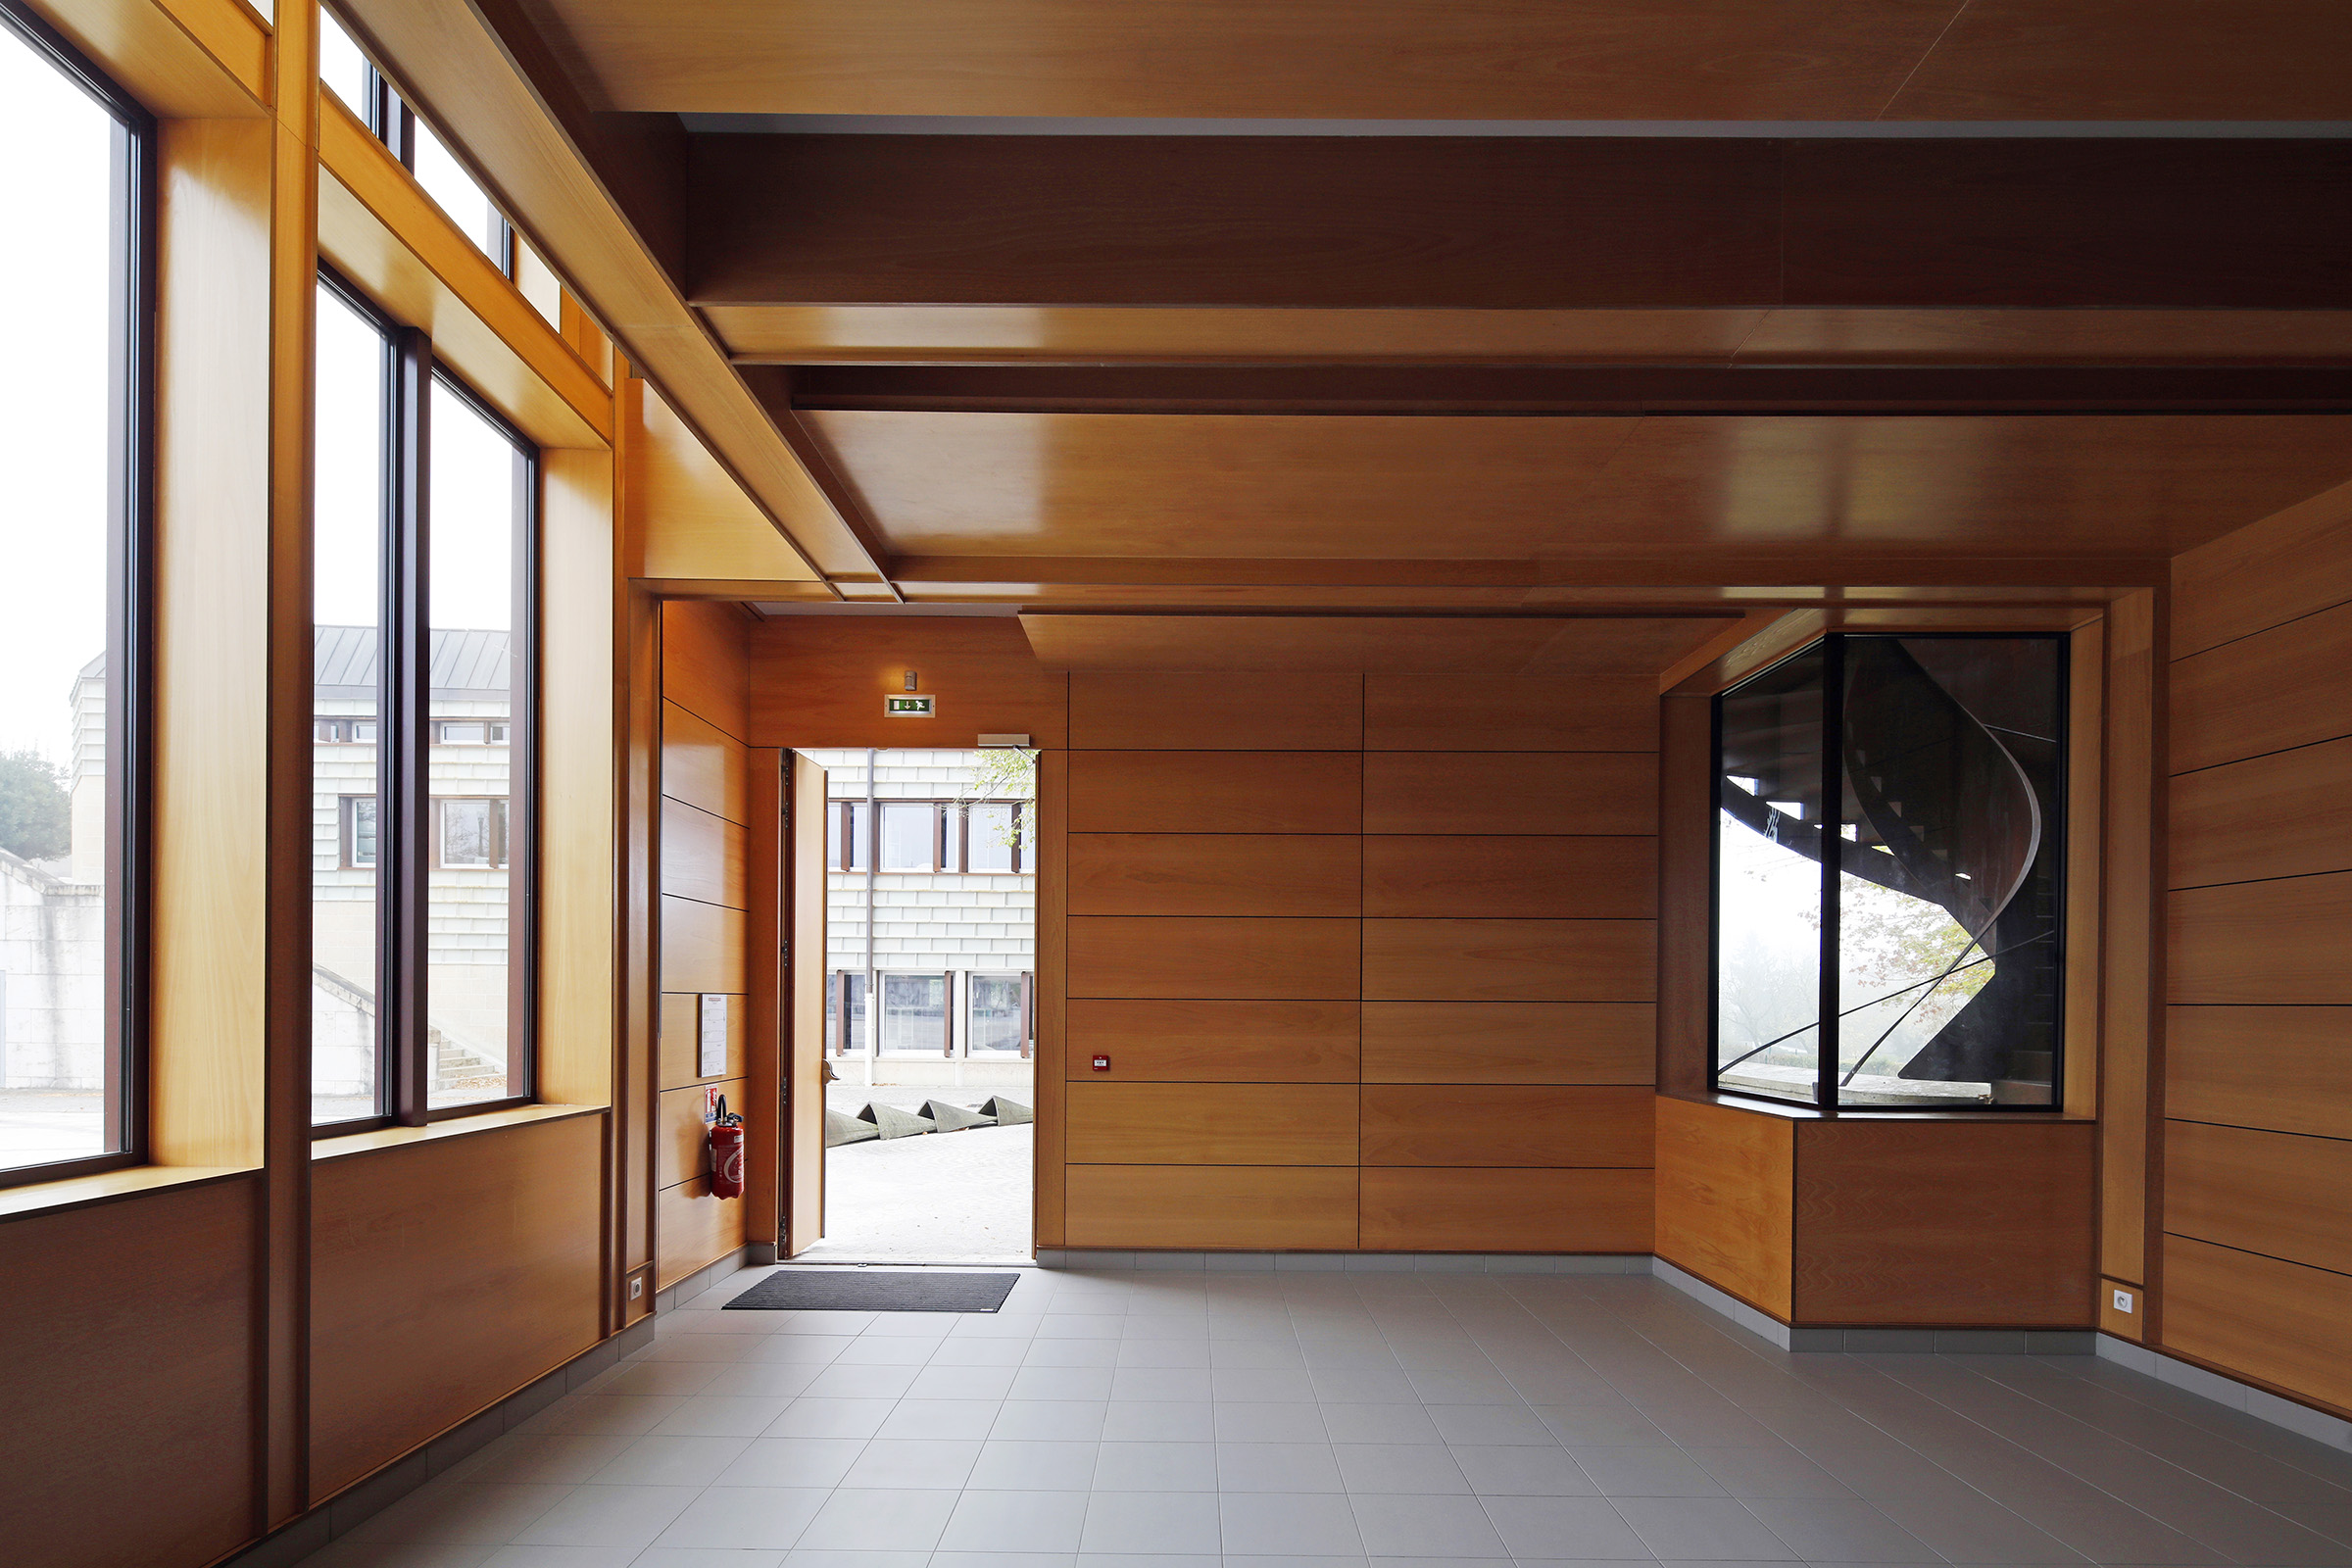 Amilly - La Maison Saint Loup - Interieur - Sylvain Dubuisson 044.jpg